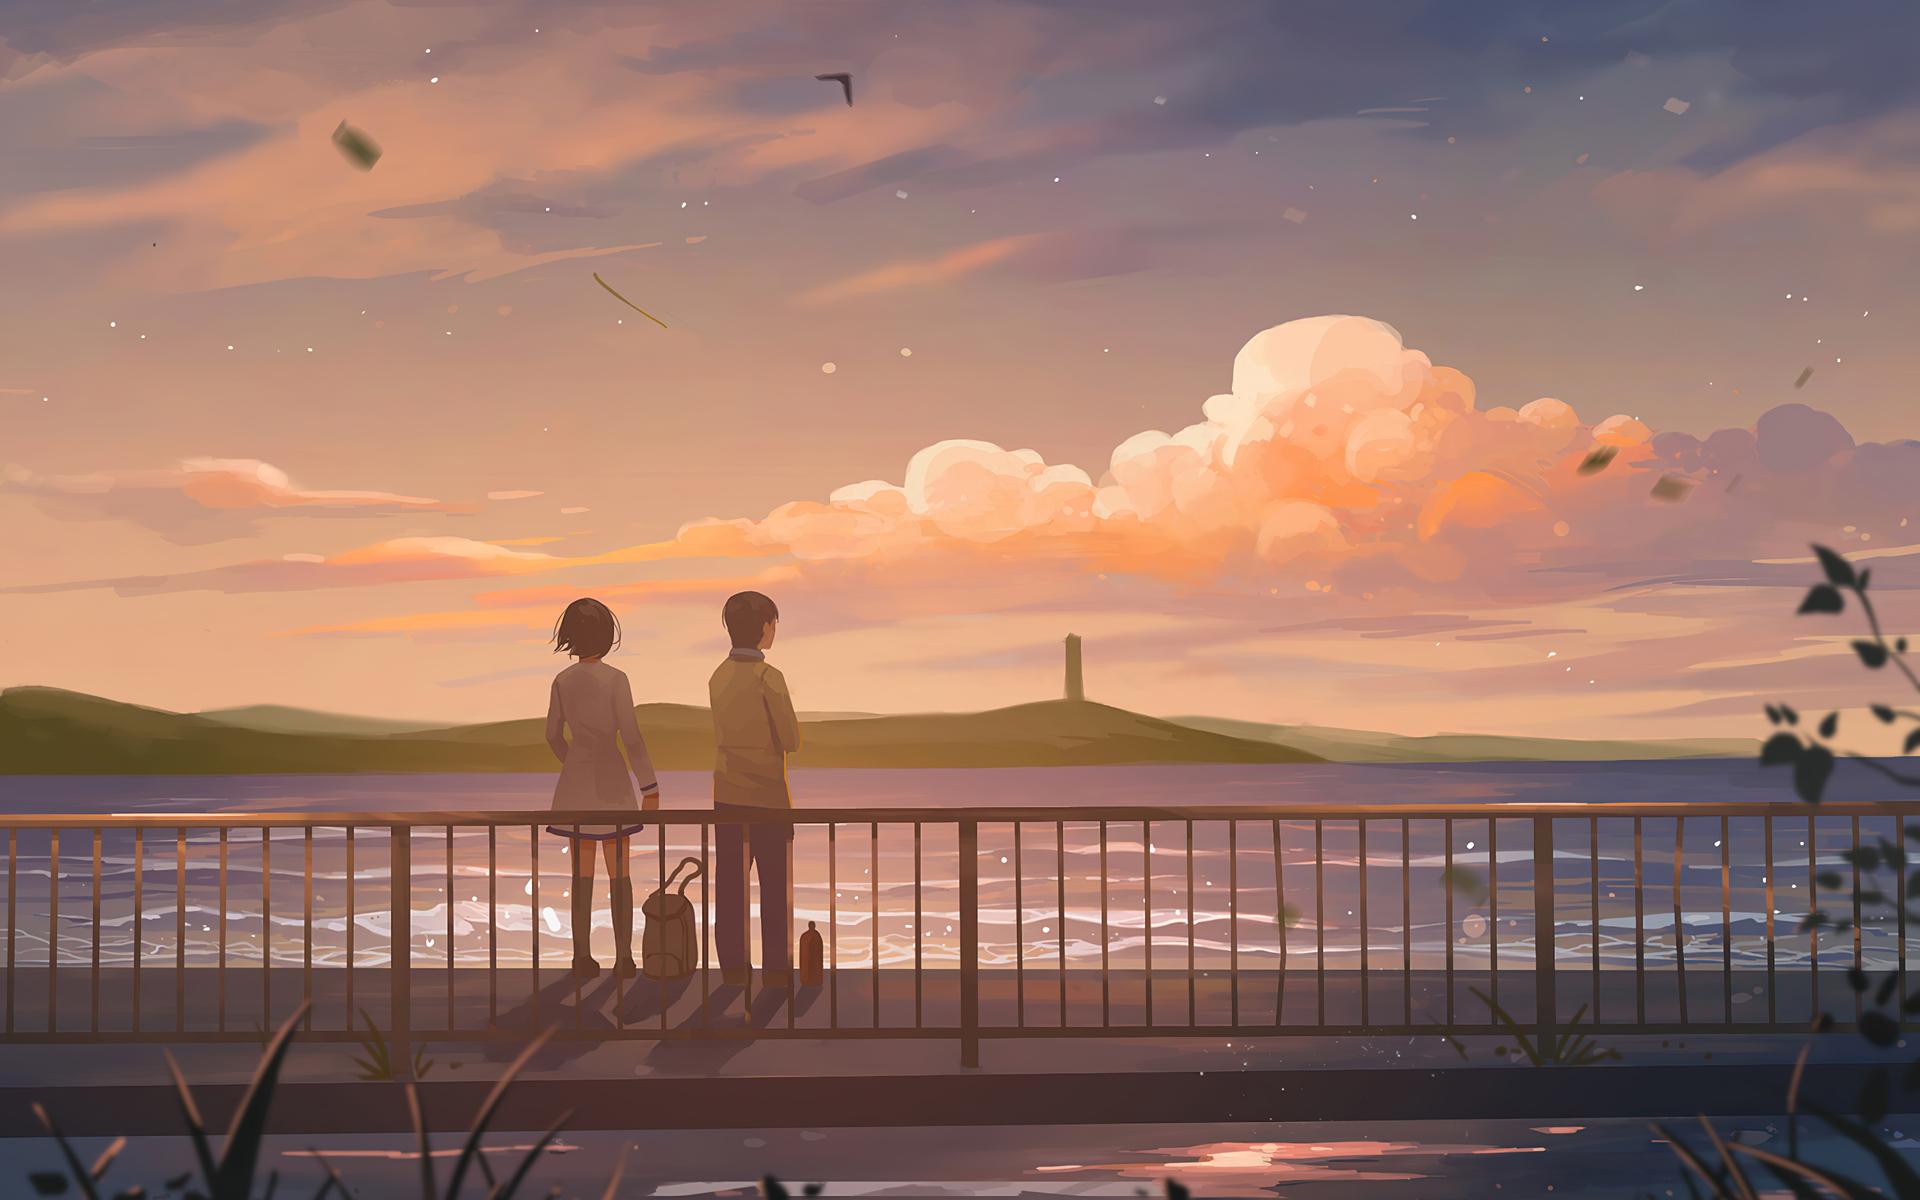 1920x1200 Anime Couple Lets Talk 4k 1080P Resolution HD 4k ...